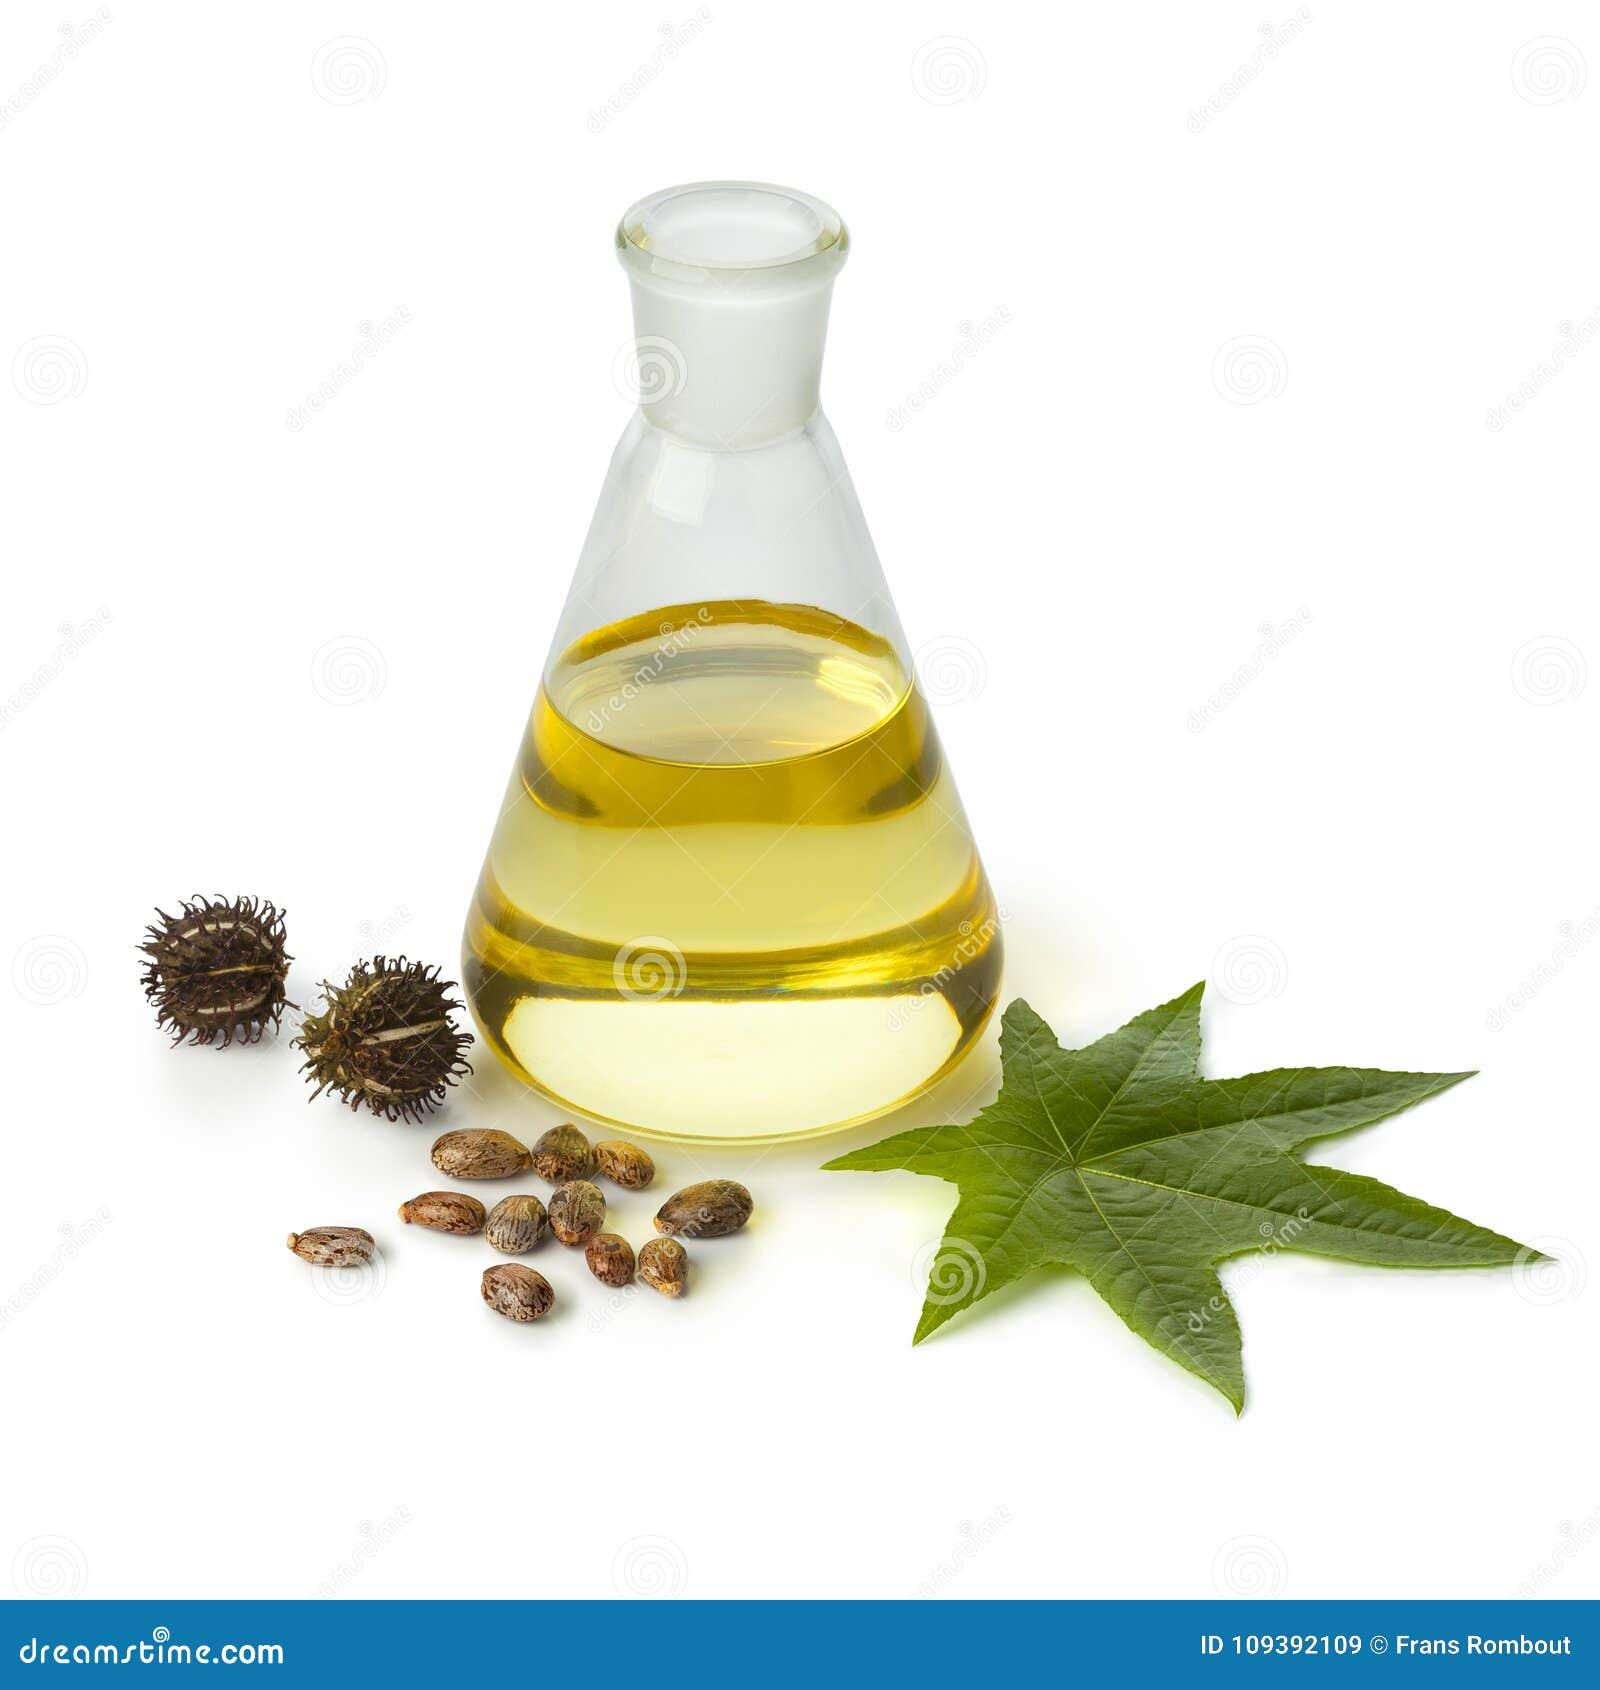 Botlle castor oil with fruit, seeds and leaf